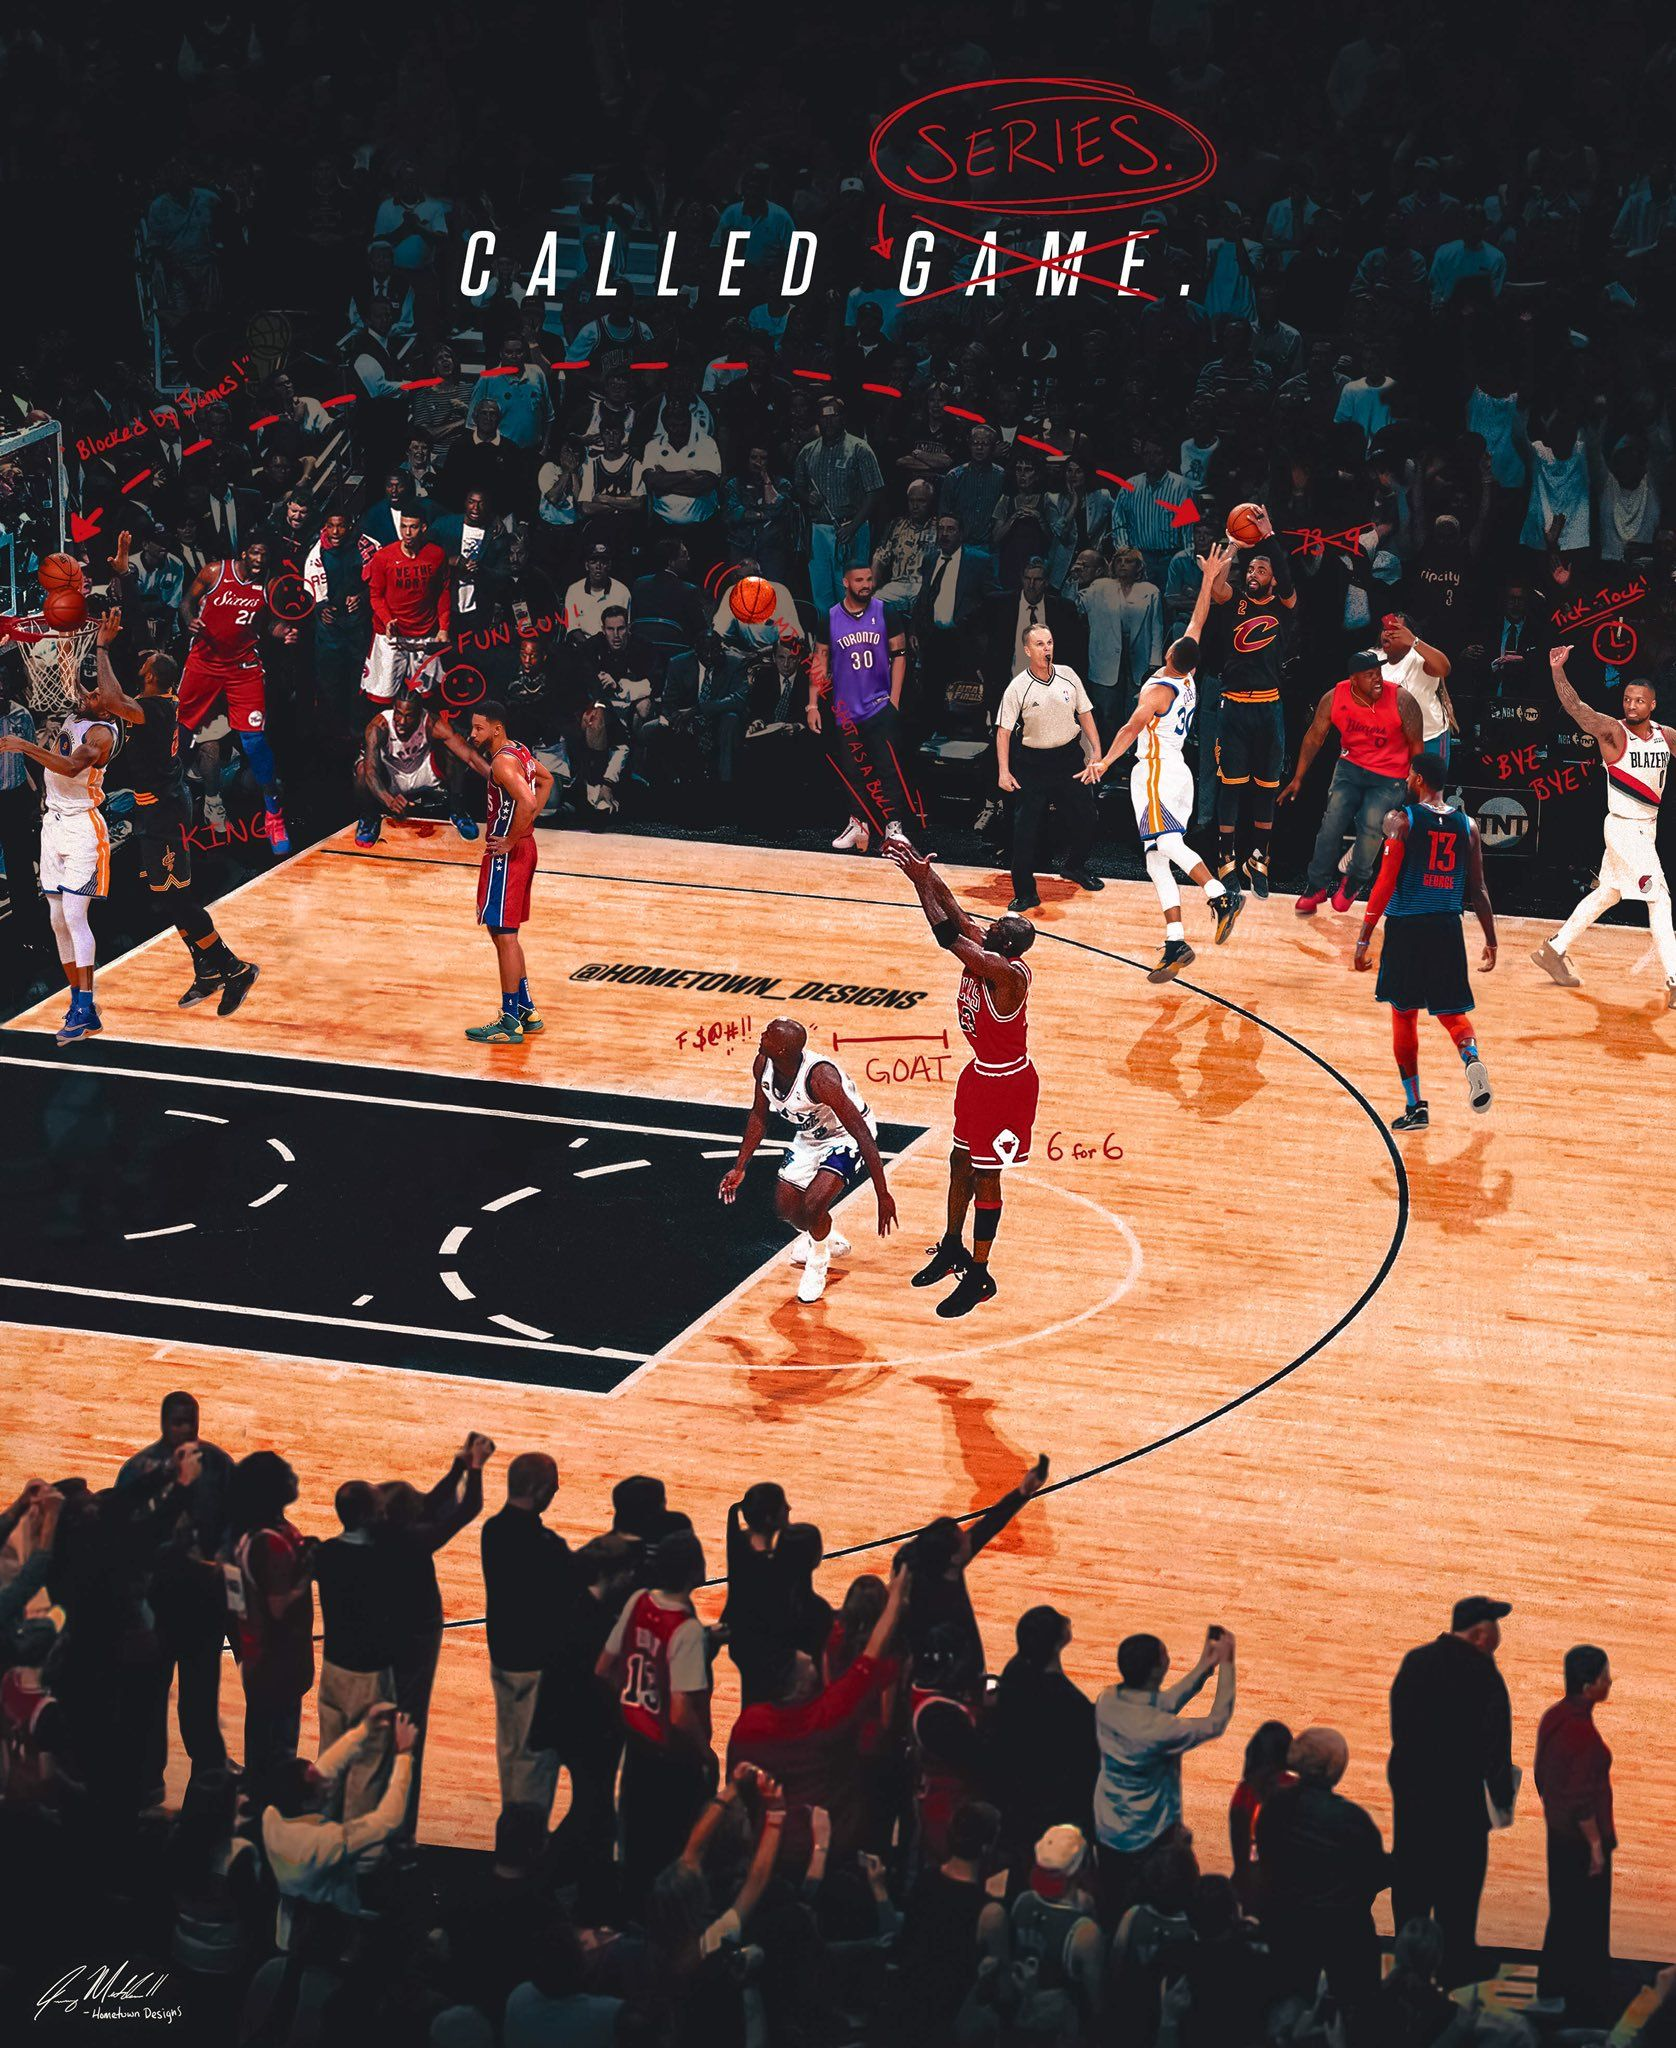 Jimmy Mitchell on Nike baloncesto, Nba y Fotos